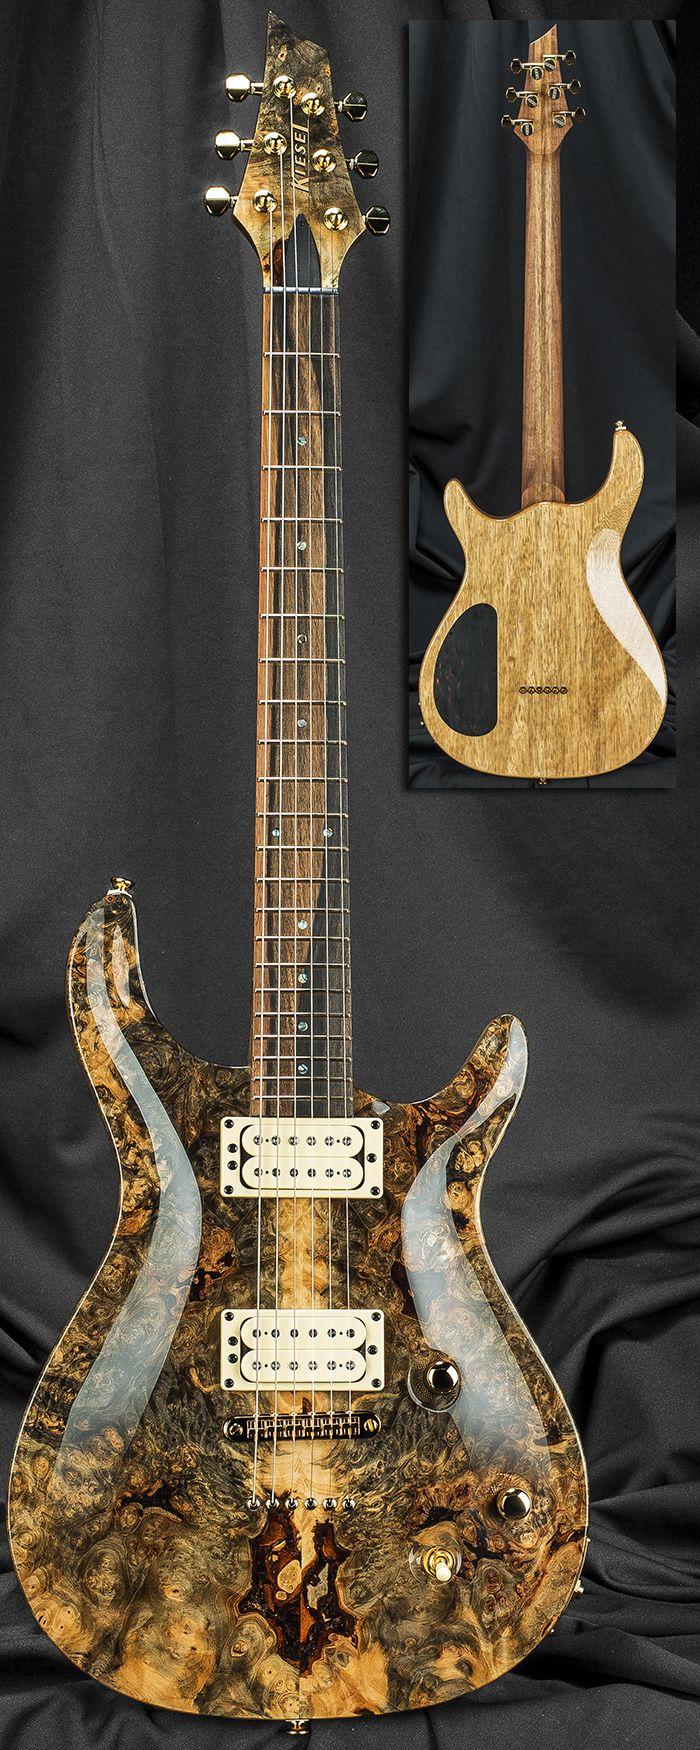 kiesel guitars ct6m california carved top guitar serial number 131725 music pinterest. Black Bedroom Furniture Sets. Home Design Ideas